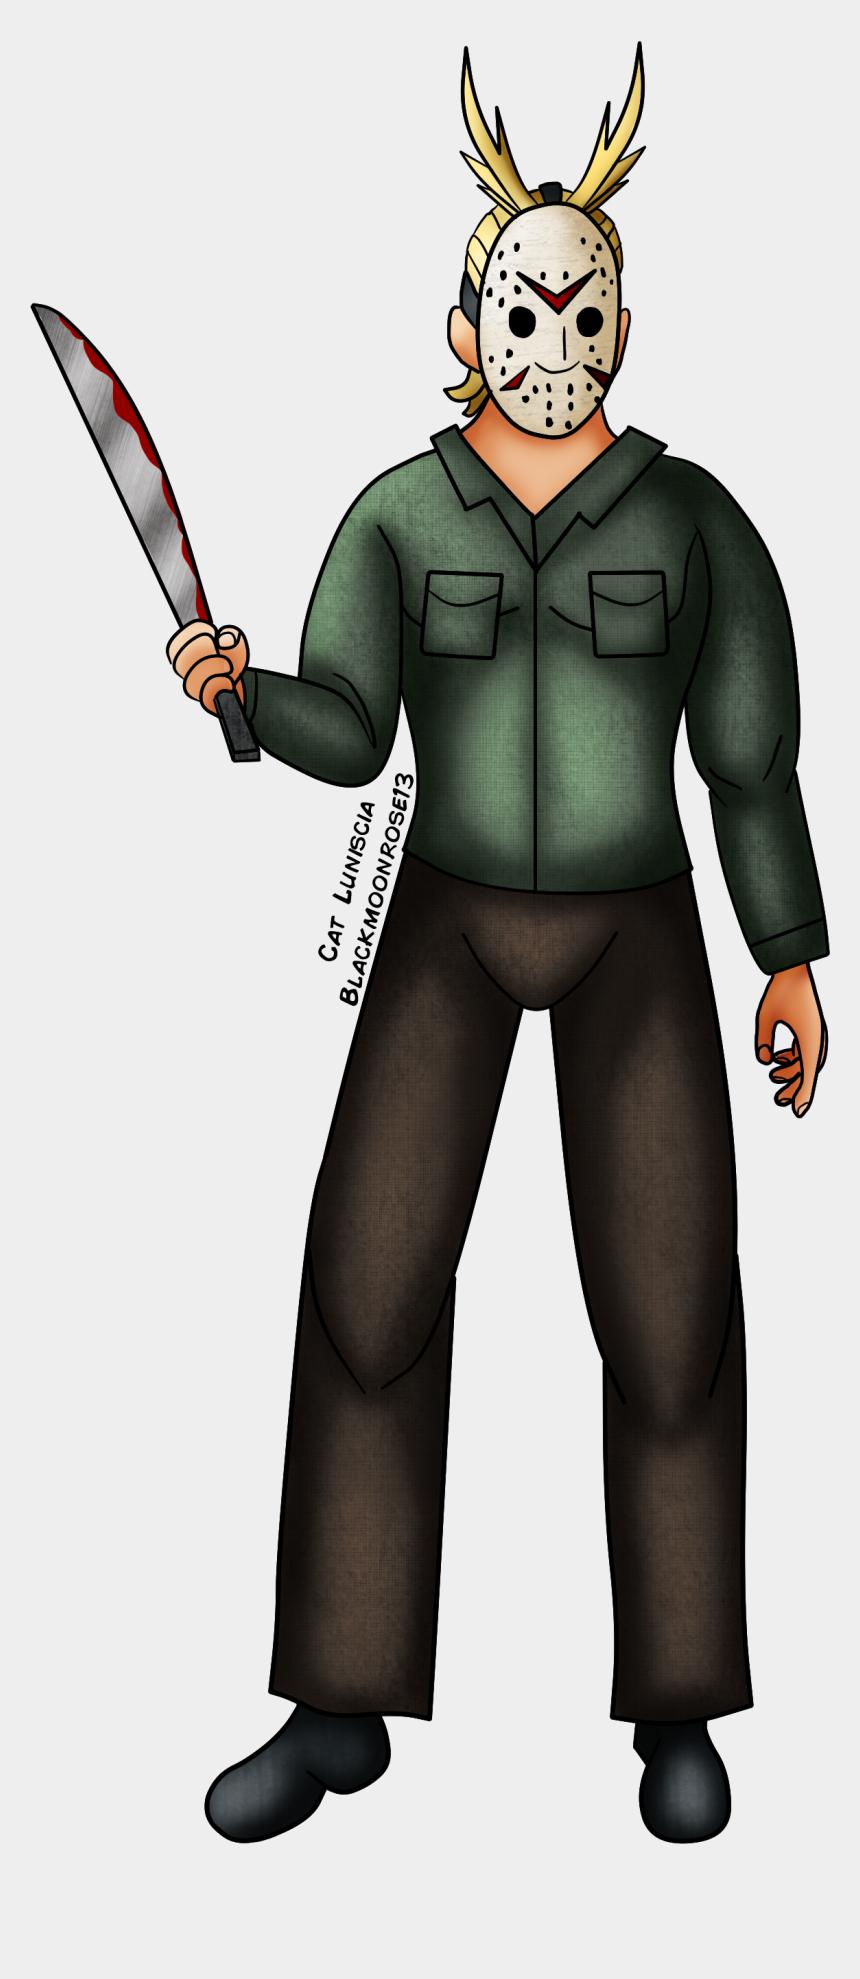 jason voorhees clip art, Cartoons - Jason Voorhees All Might - Jason Voorhees Anime Character